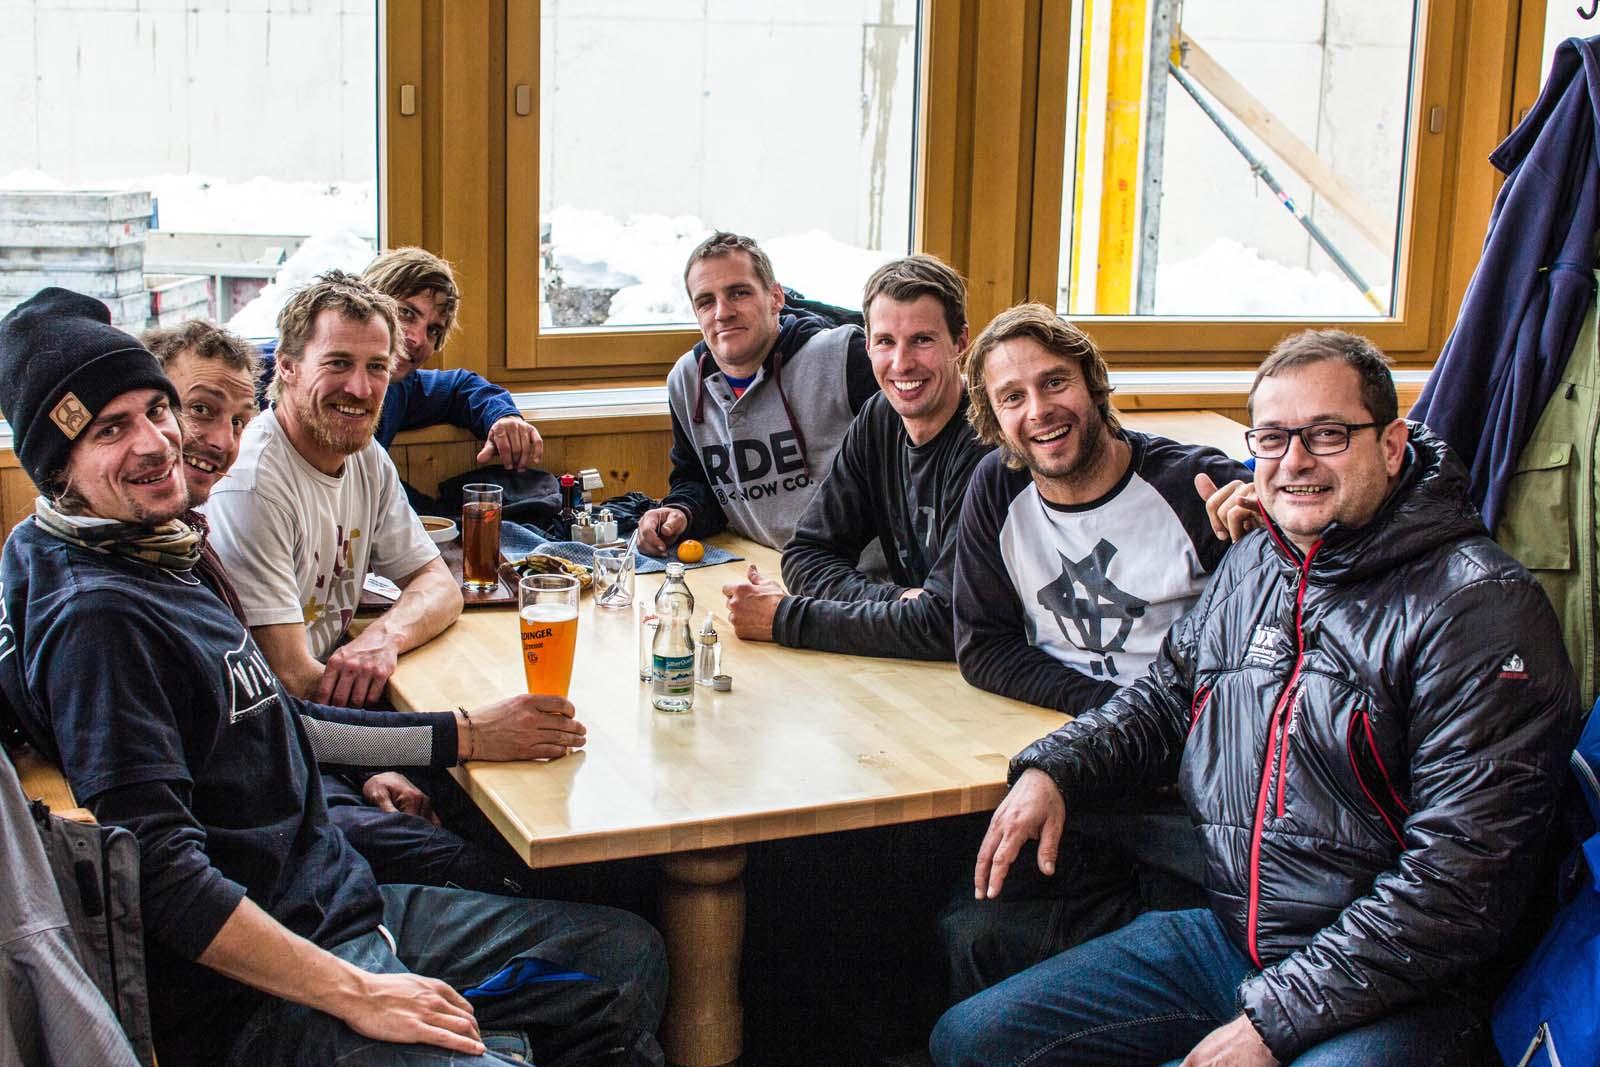 Zillertal Välley Rälley hosted by Ride Snowboards 2015 / 2016 - Die Ästhetiker Crew - Foto: Albert Binnekade